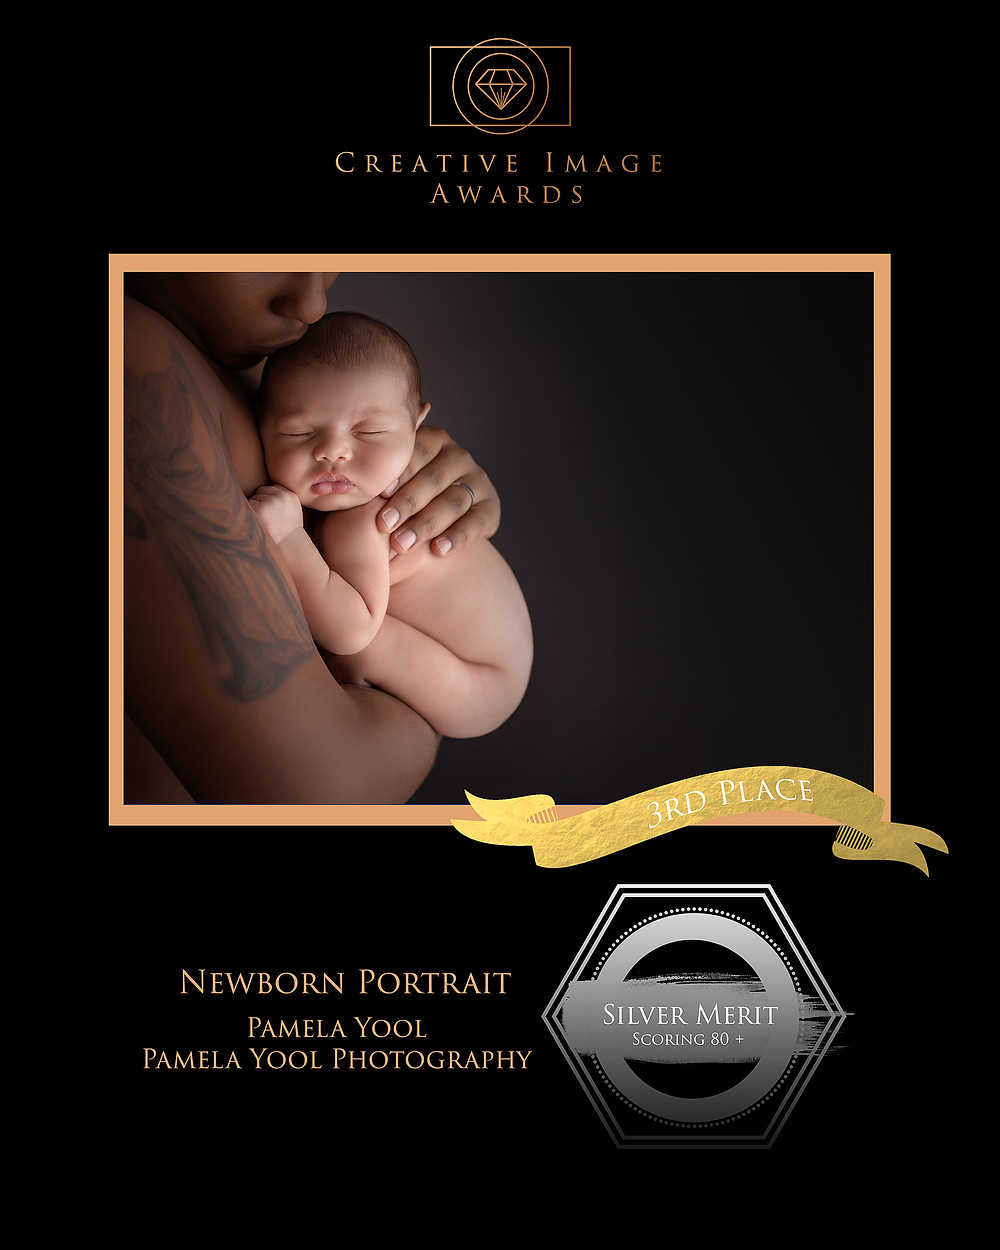 Newborn Portrait Award Winning Image - Pamela Yool Photography